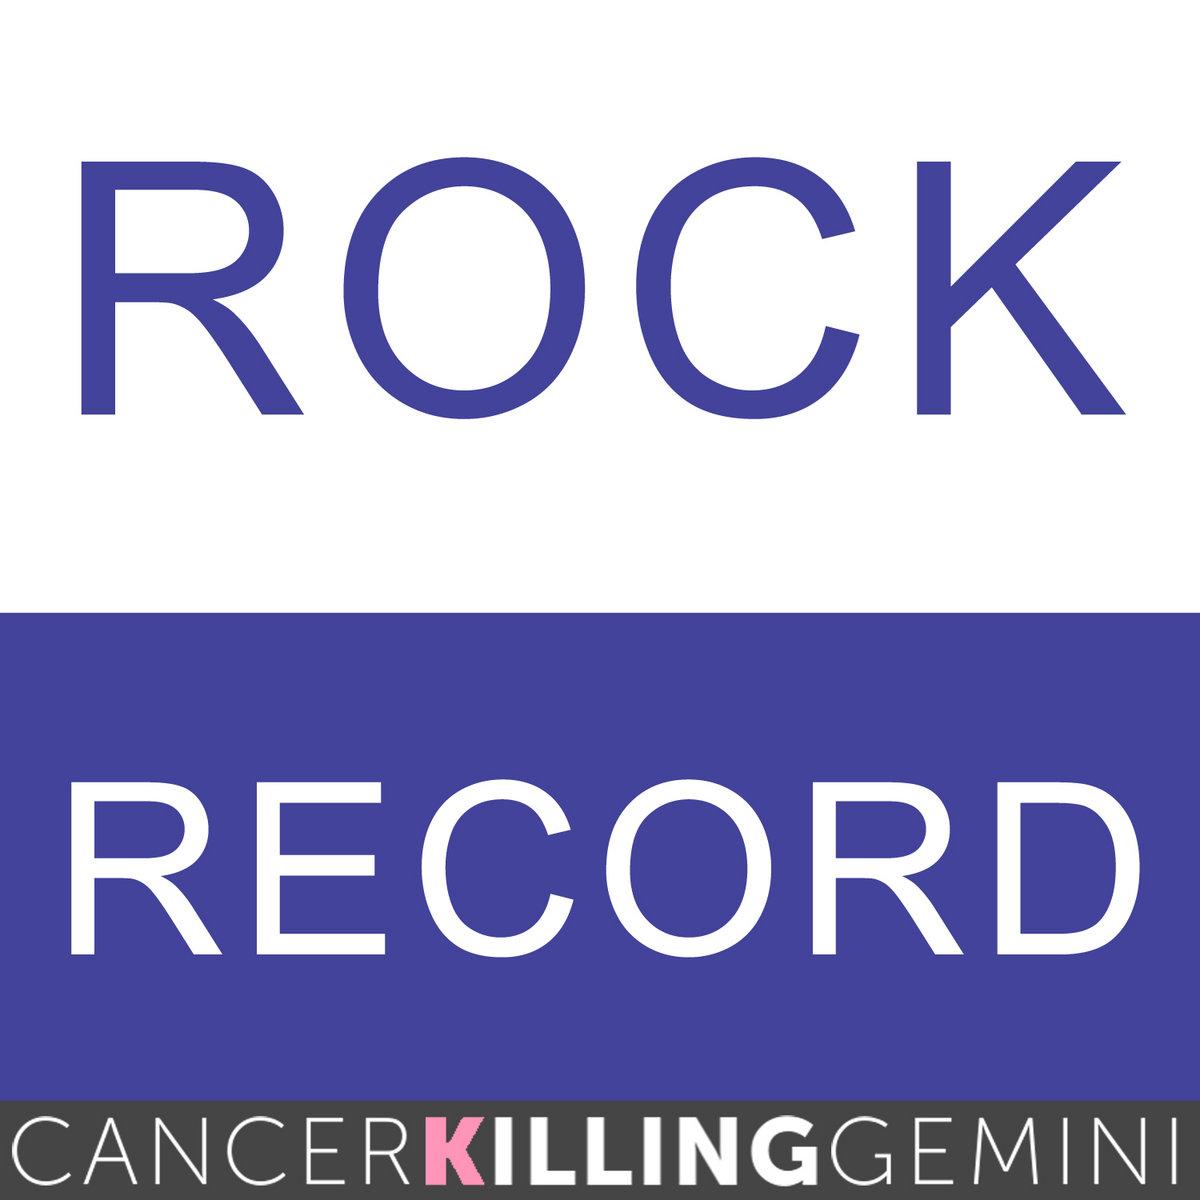 Cancer Killing Gemini